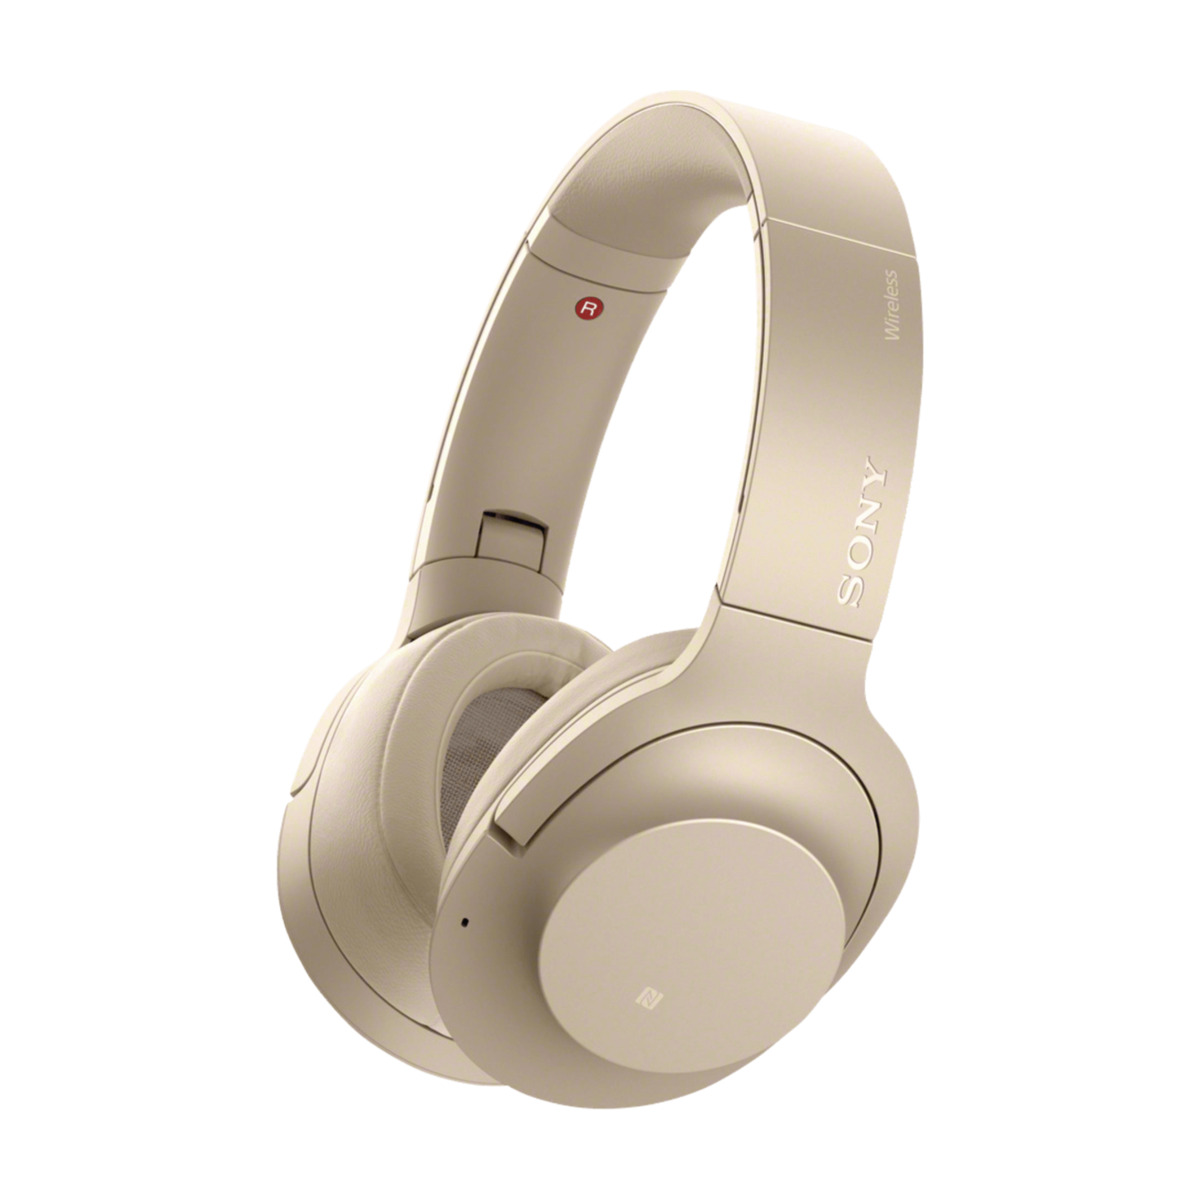 sony wh 900N svart headset | FINN.no